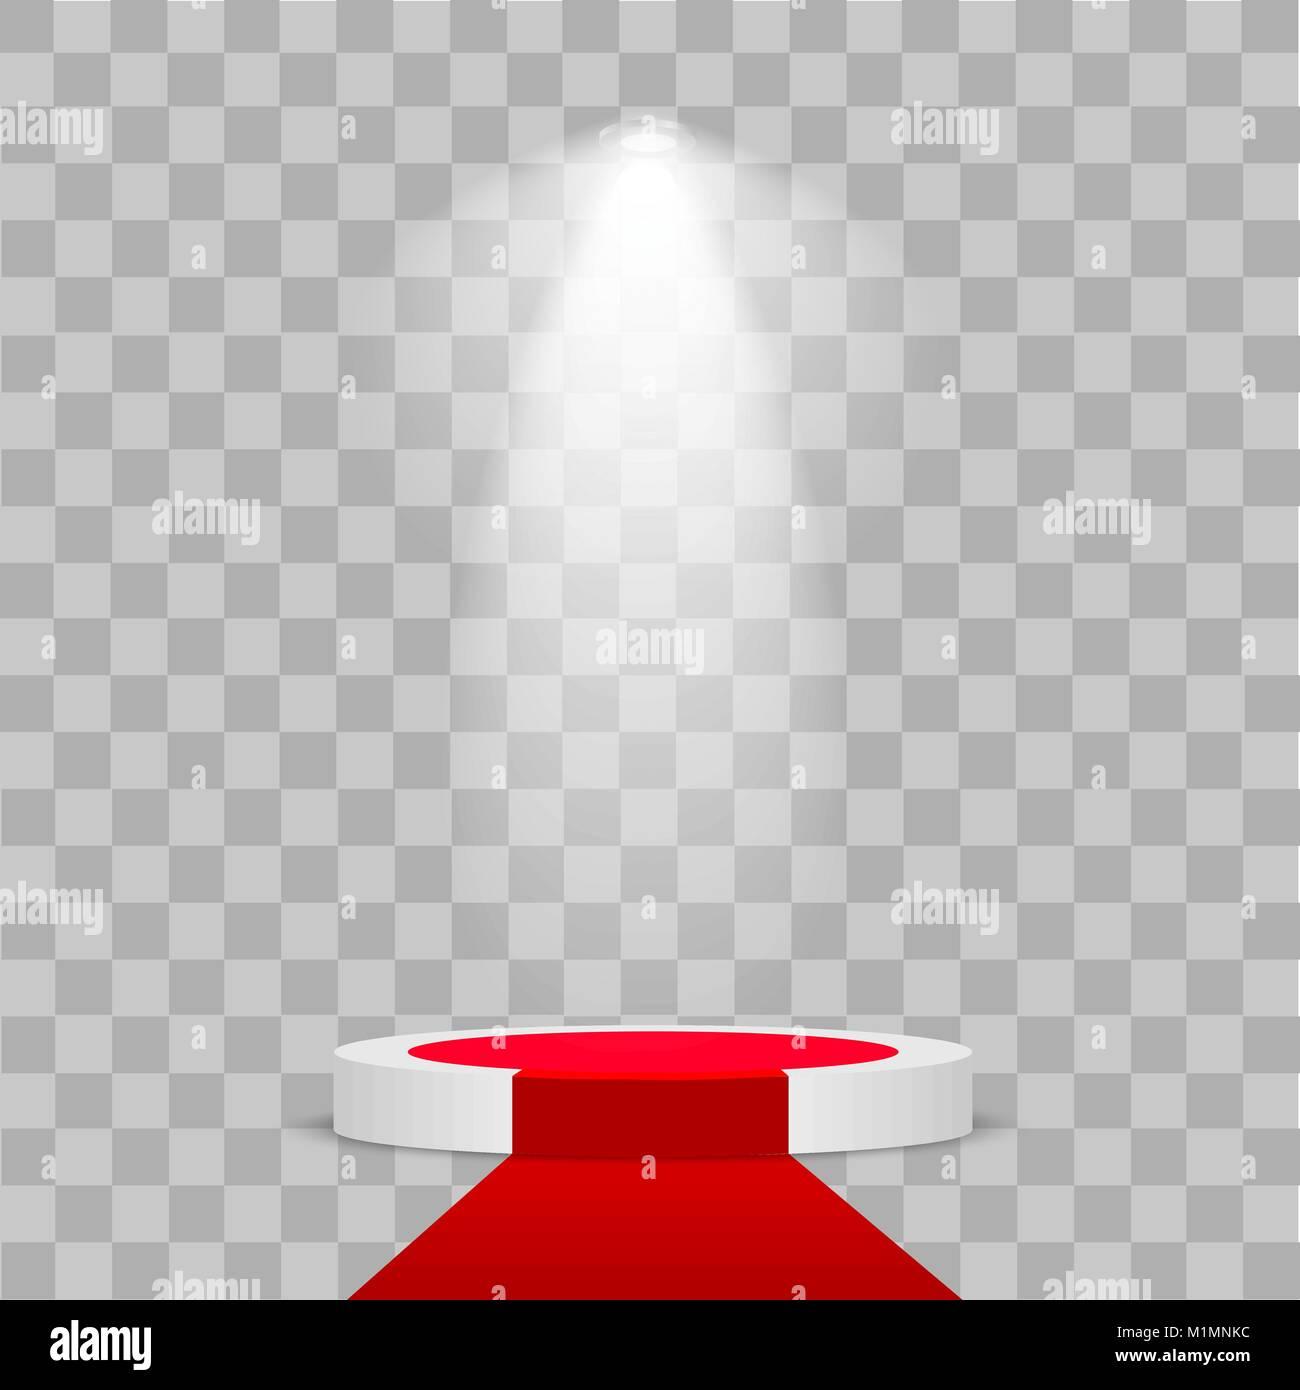 round stage podium illuminated with light on transparent background